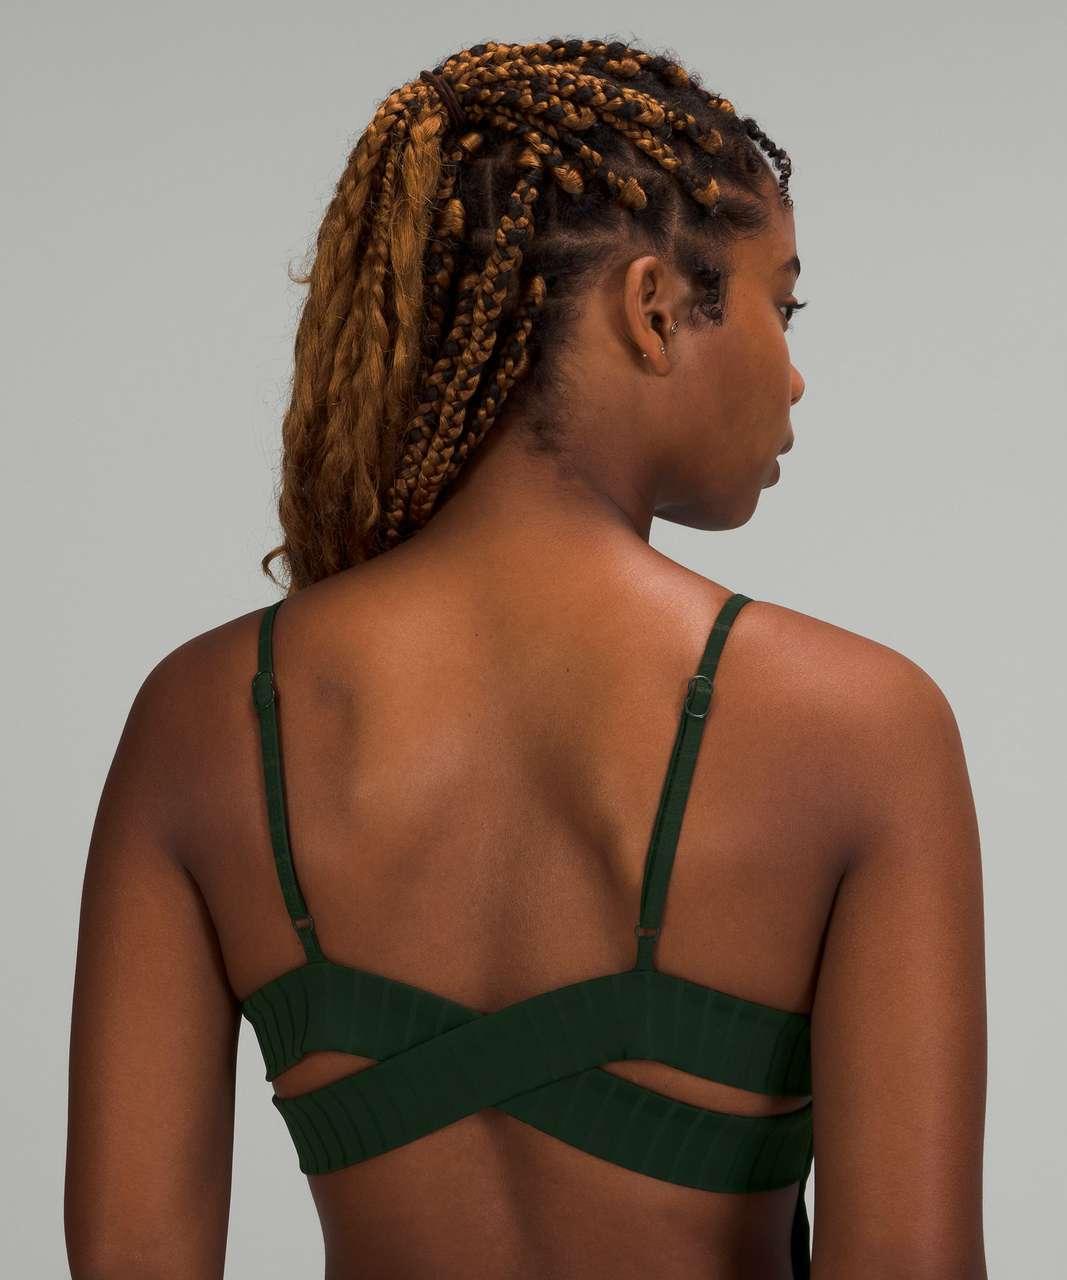 Lululemon Ribbed High-Neck Cross-Back One-Piece - Rainforest Green